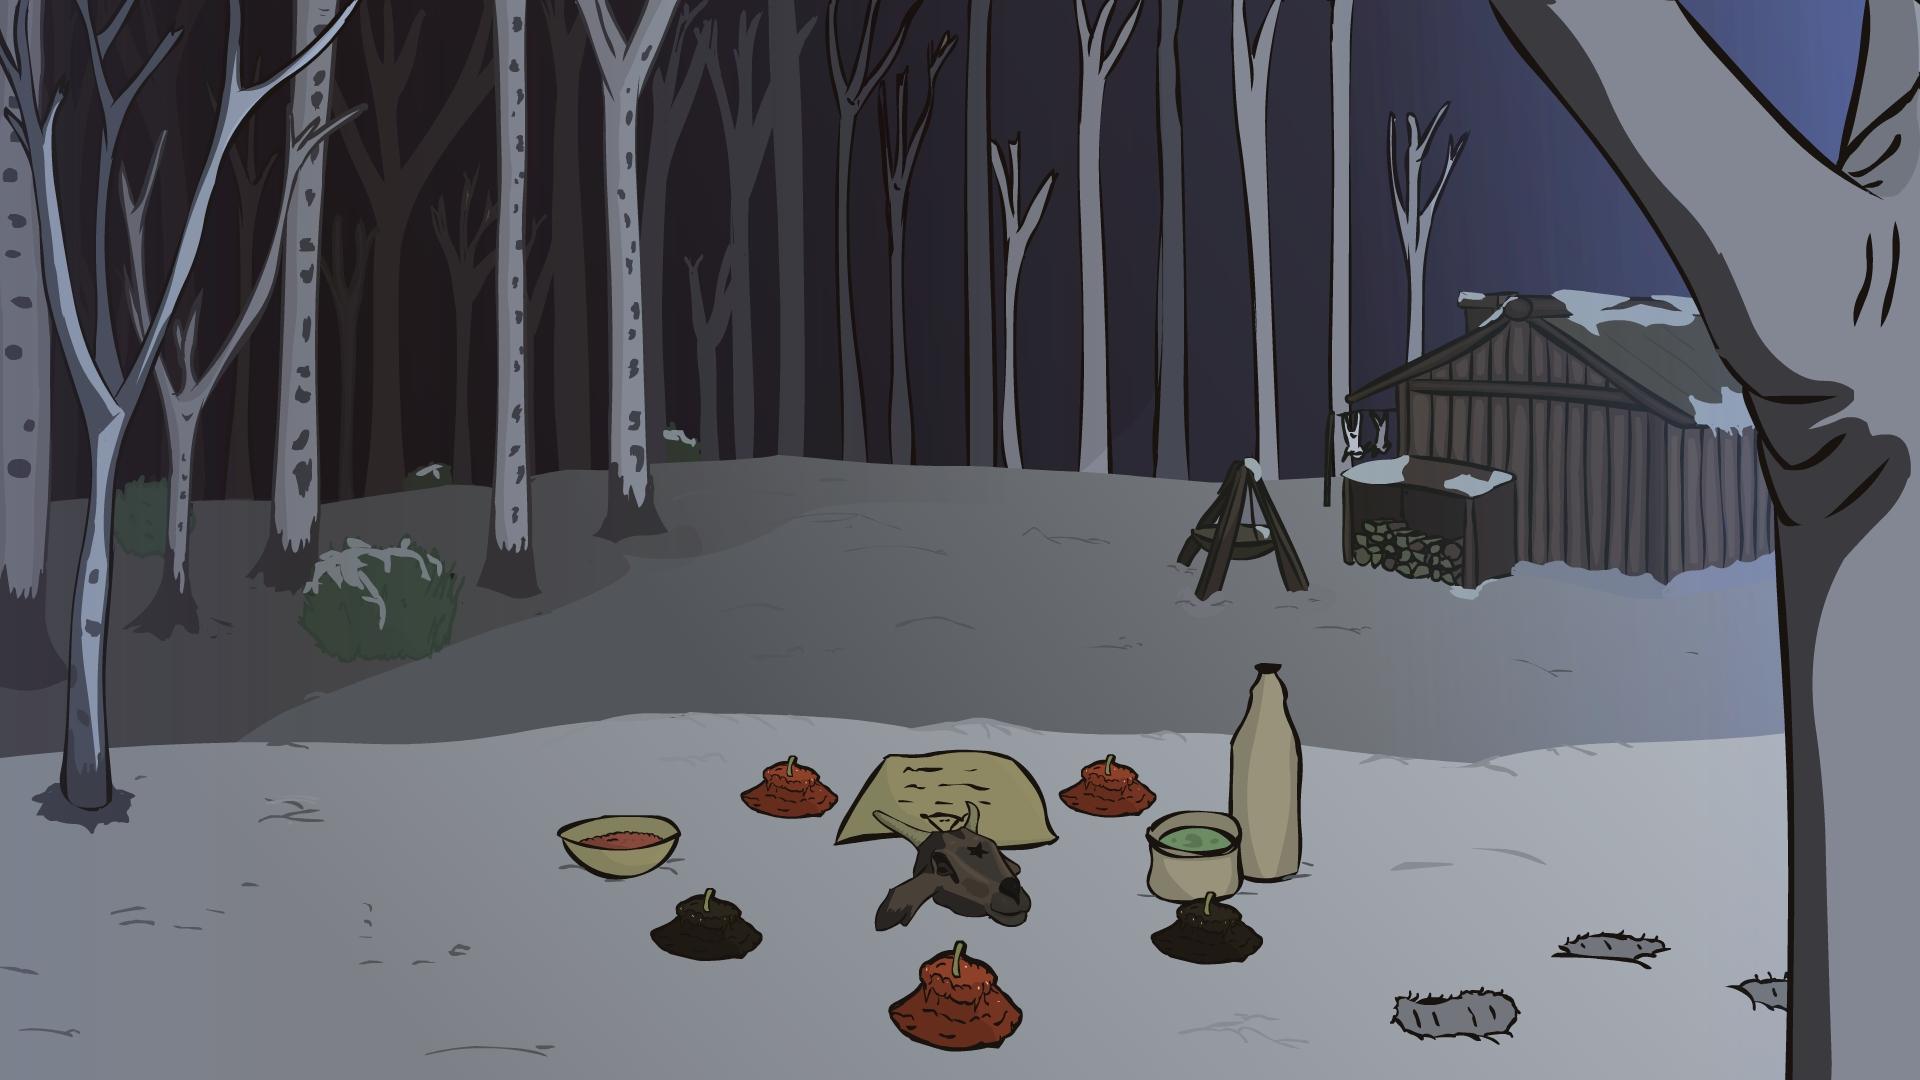 horror forest back